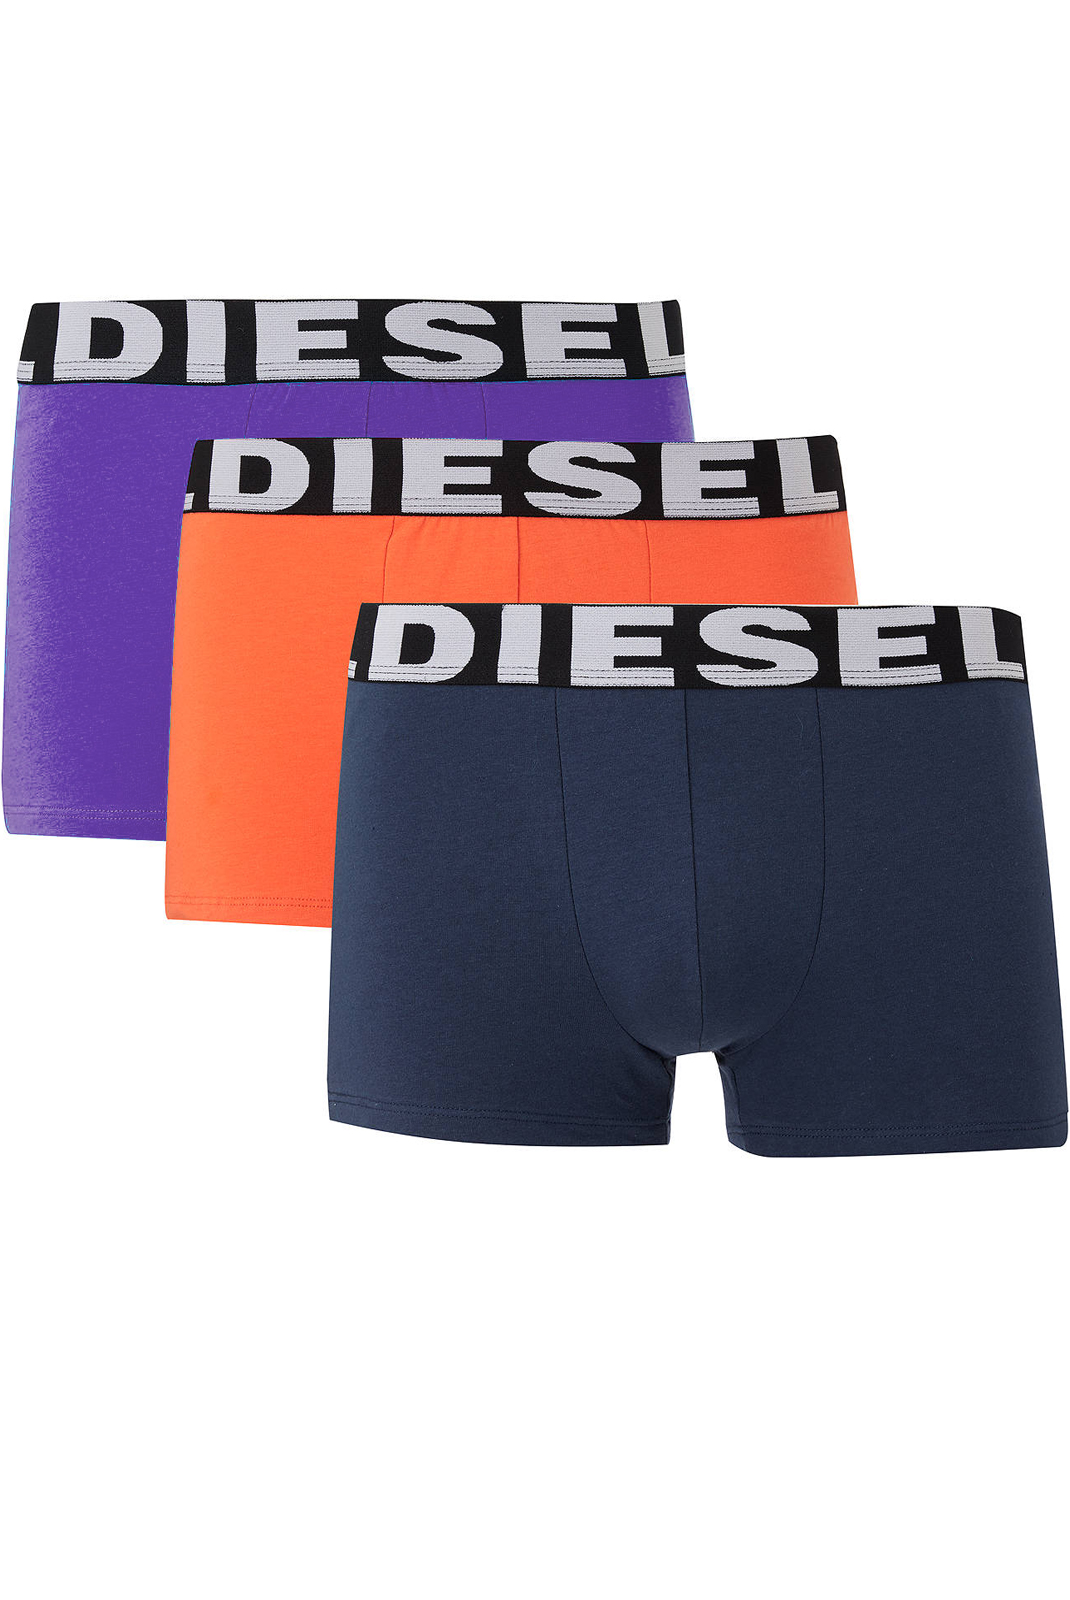 Slips-Caleçons  Diesel SHAWN 0AAMT ROUGE/VIOLET/GRIS